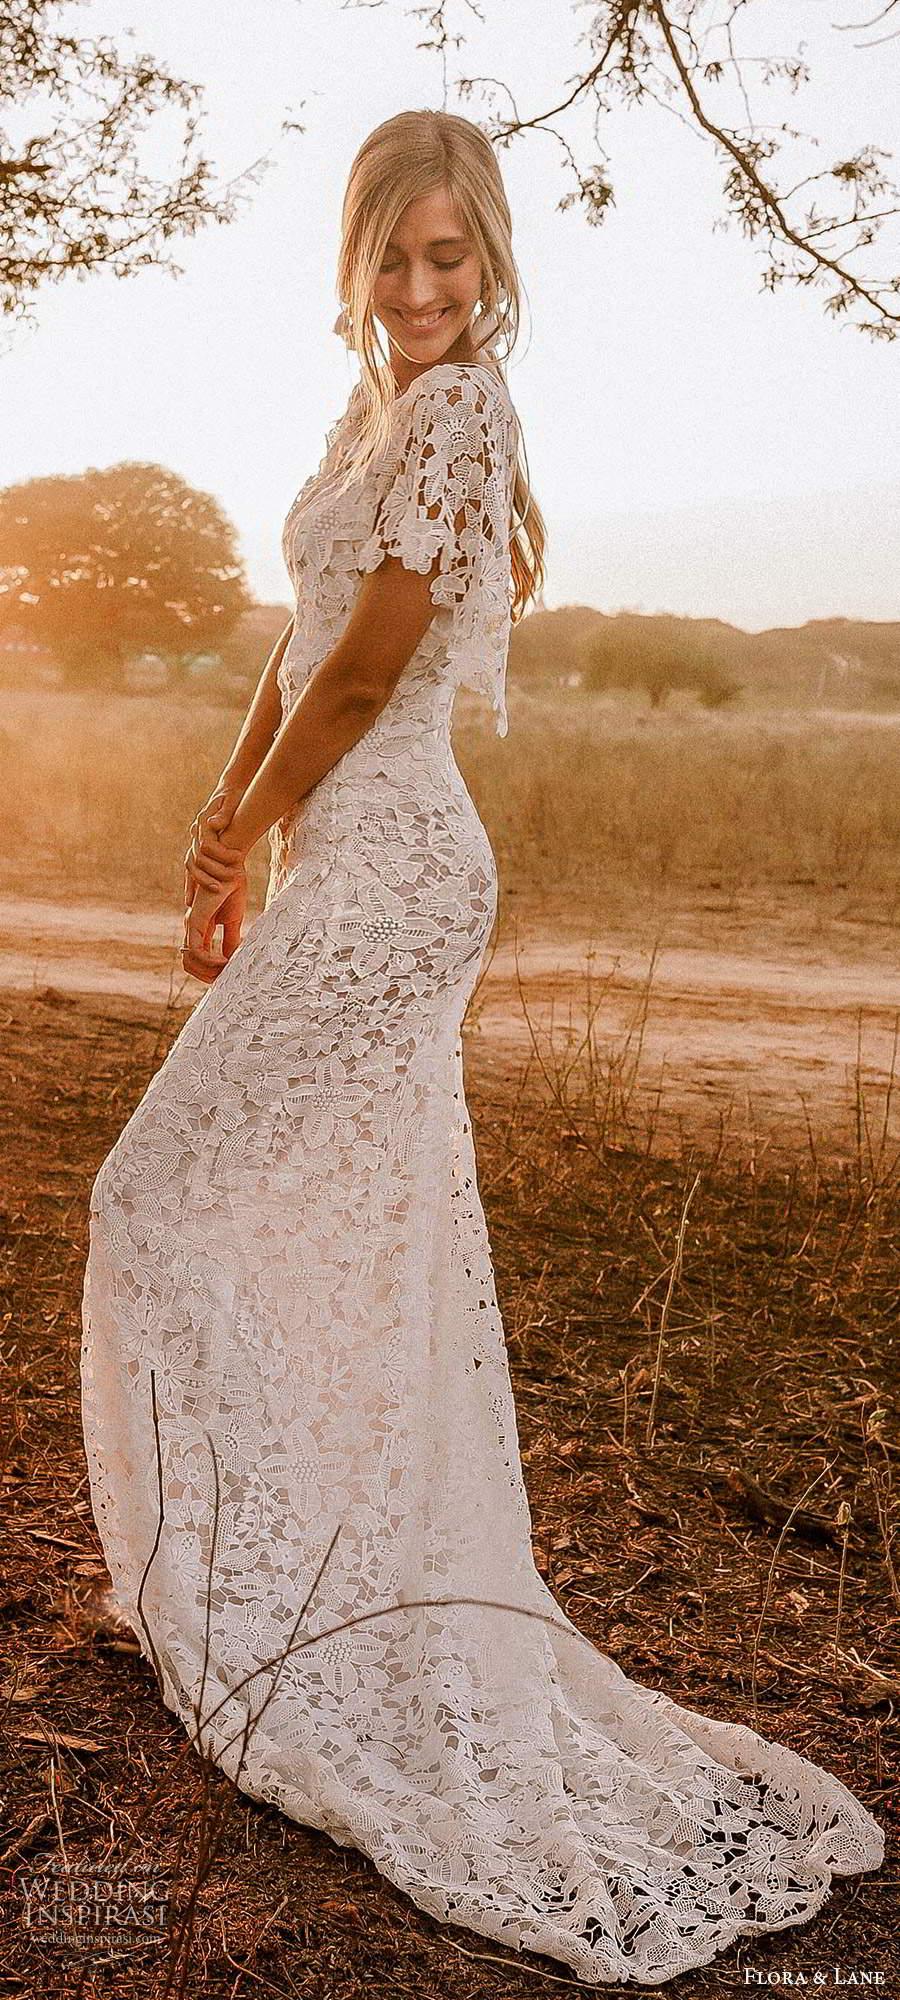 flora and lane 2019 bridal flutter sleeves scoop neckline fully embellished lace sheath romantic boho wedding dress scoop back chapel train (4) sv